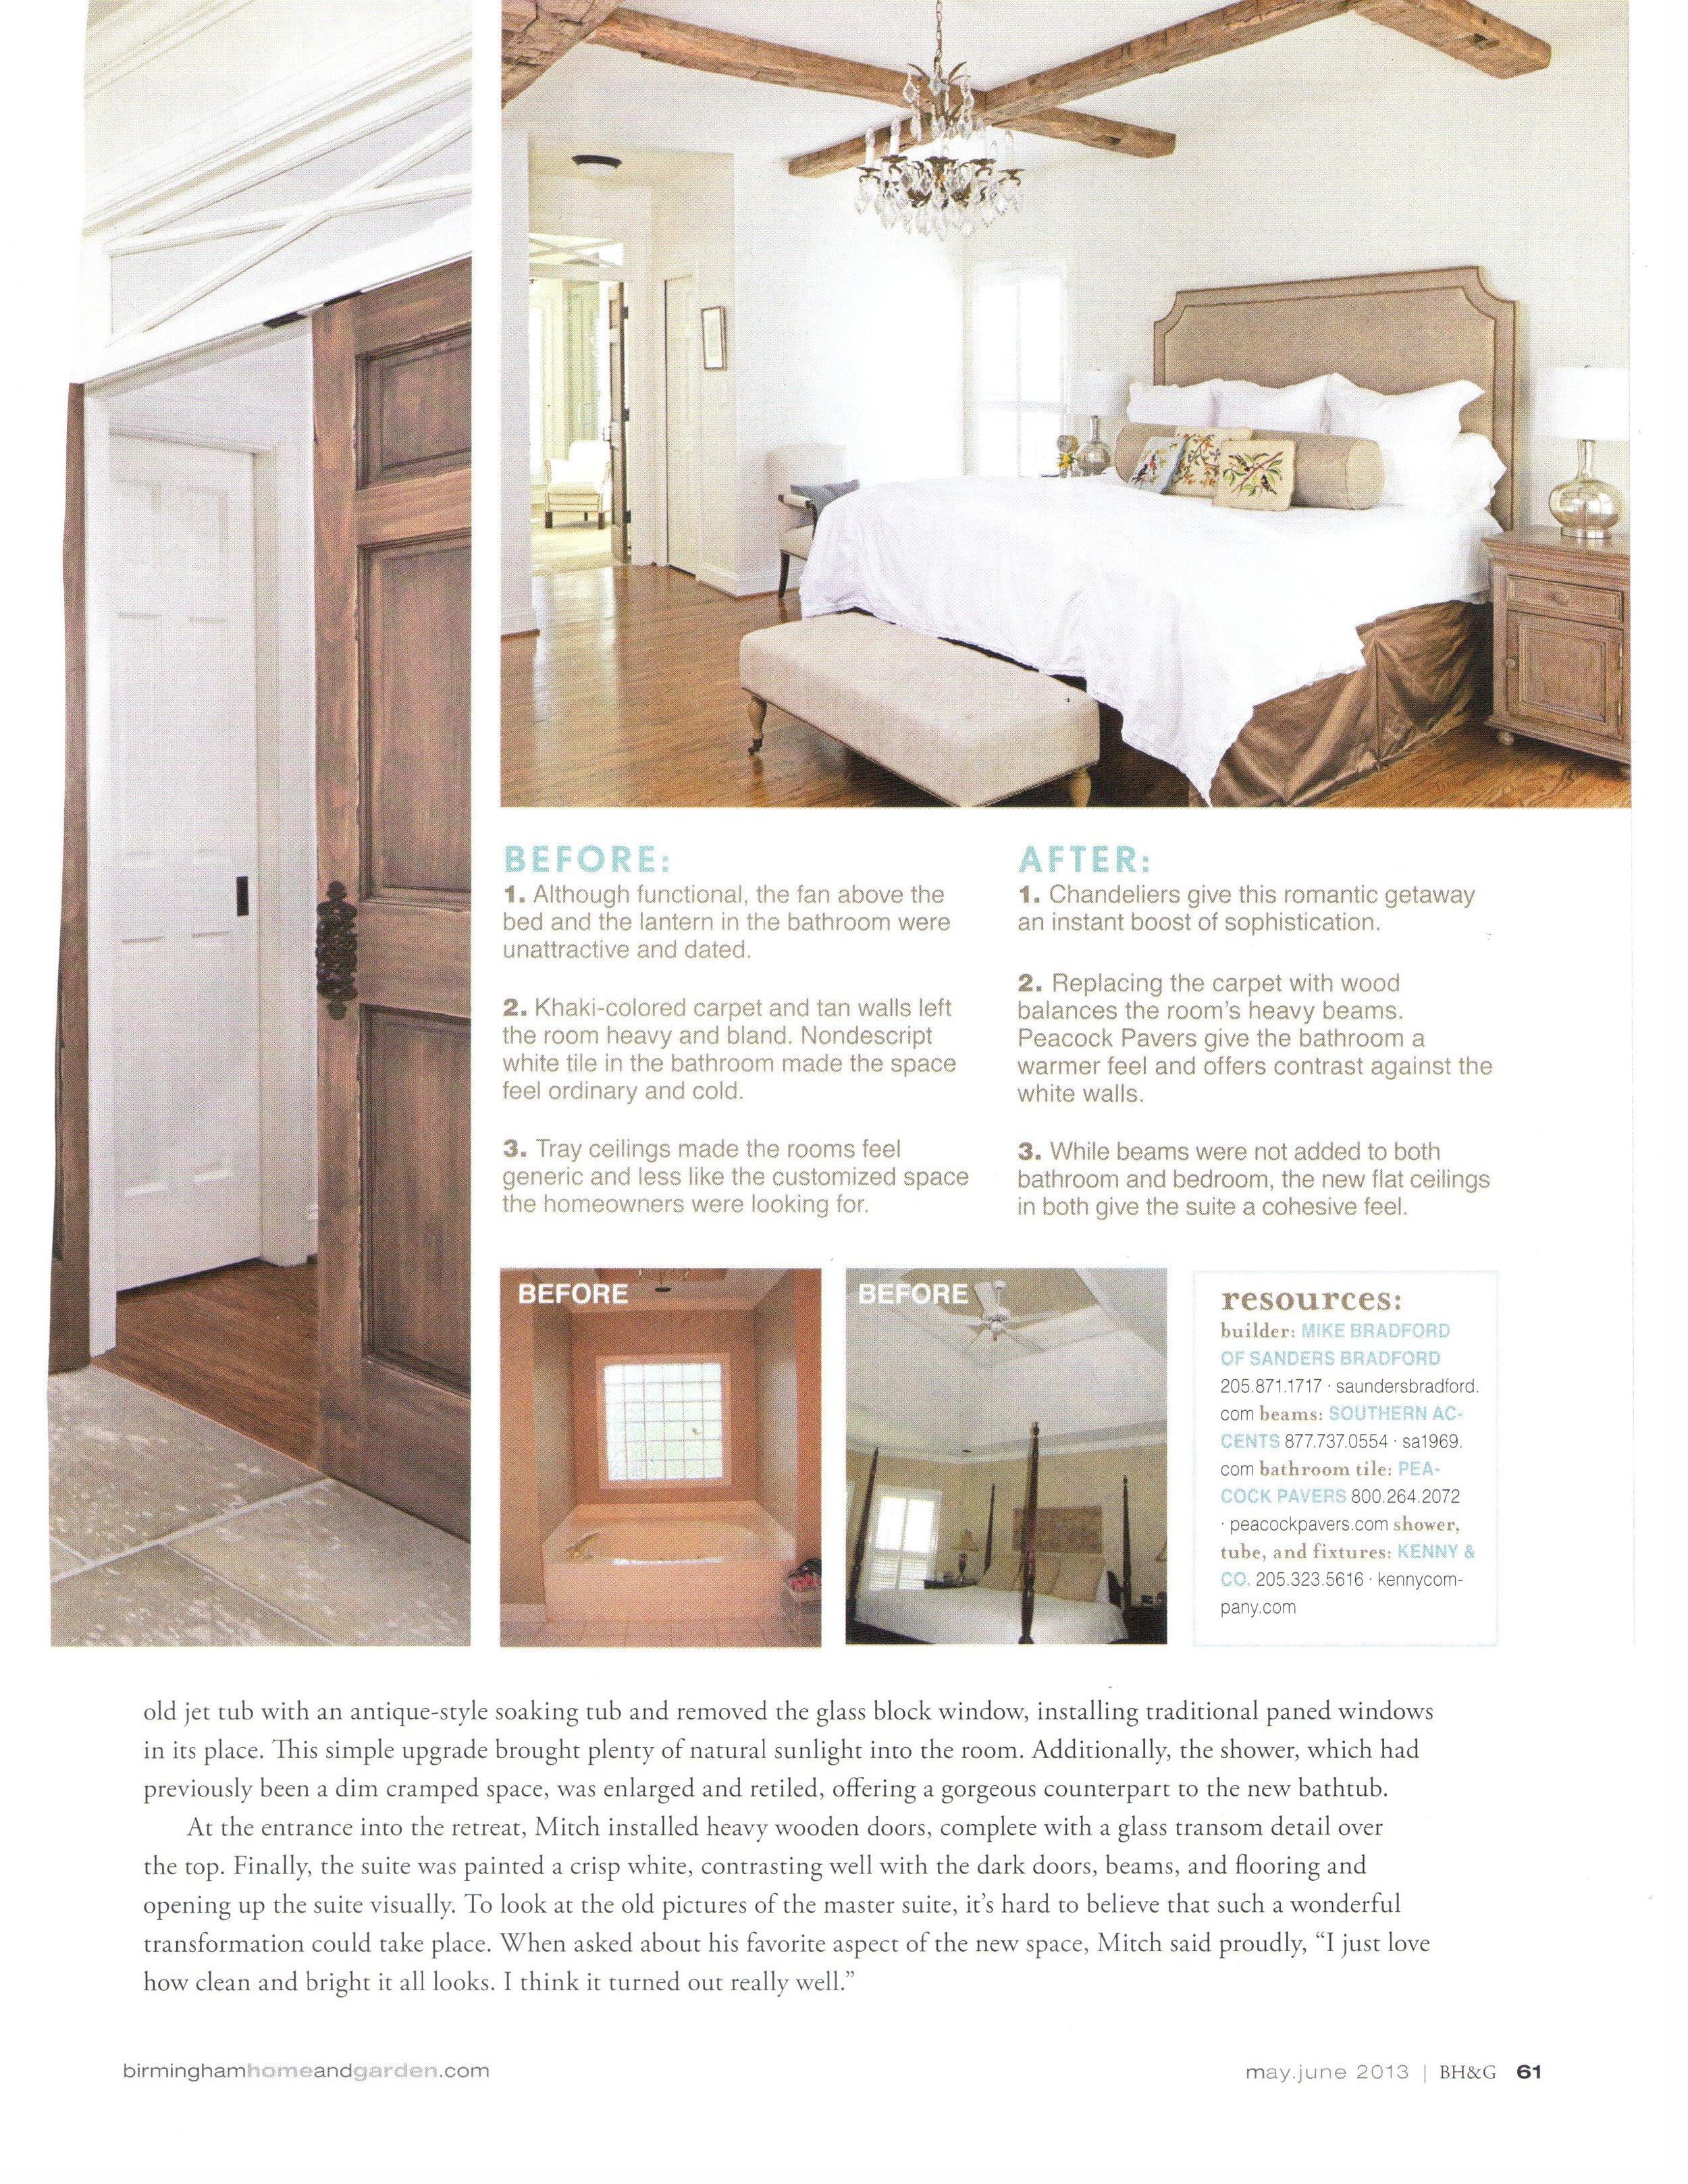 B'Ham Home & Garden Suite Upgrade magazine page 6 architecture exterior and interior design Alabama